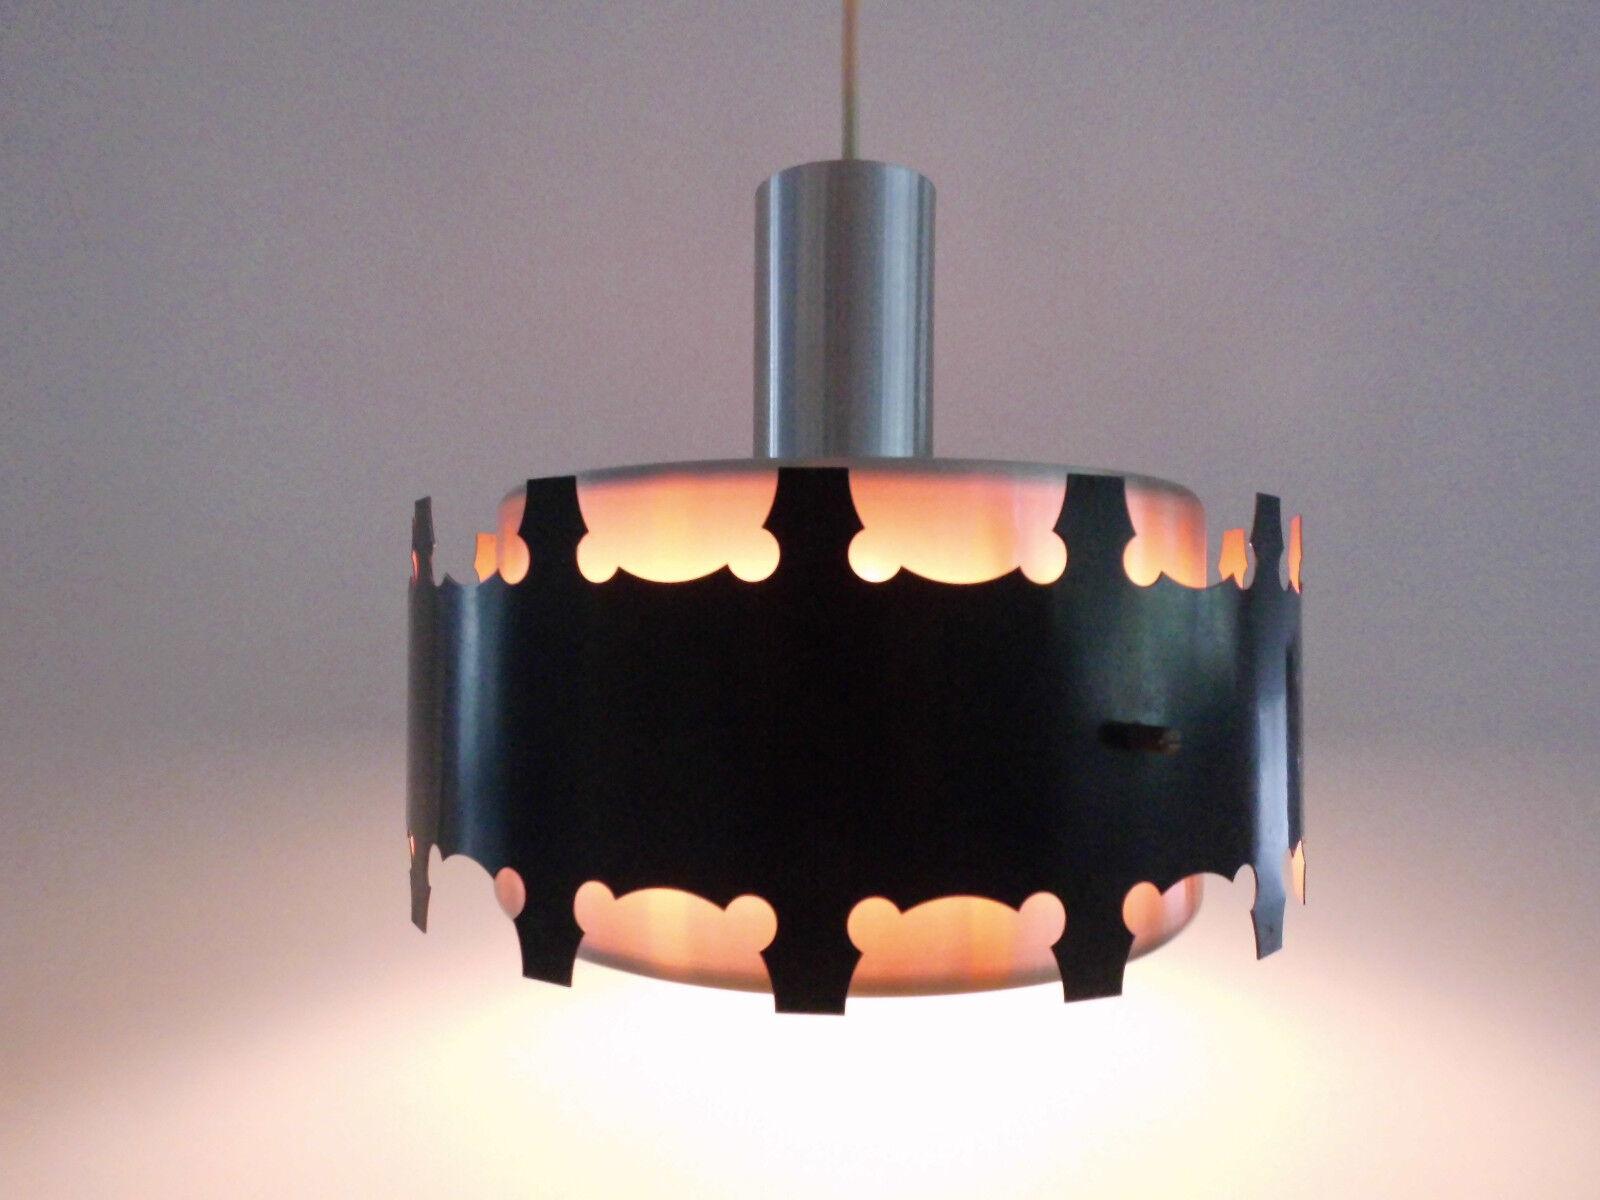 70er Lampe Danish Design Pendelleuchte Hängelampe Gold schwarz Fog Morup Ära